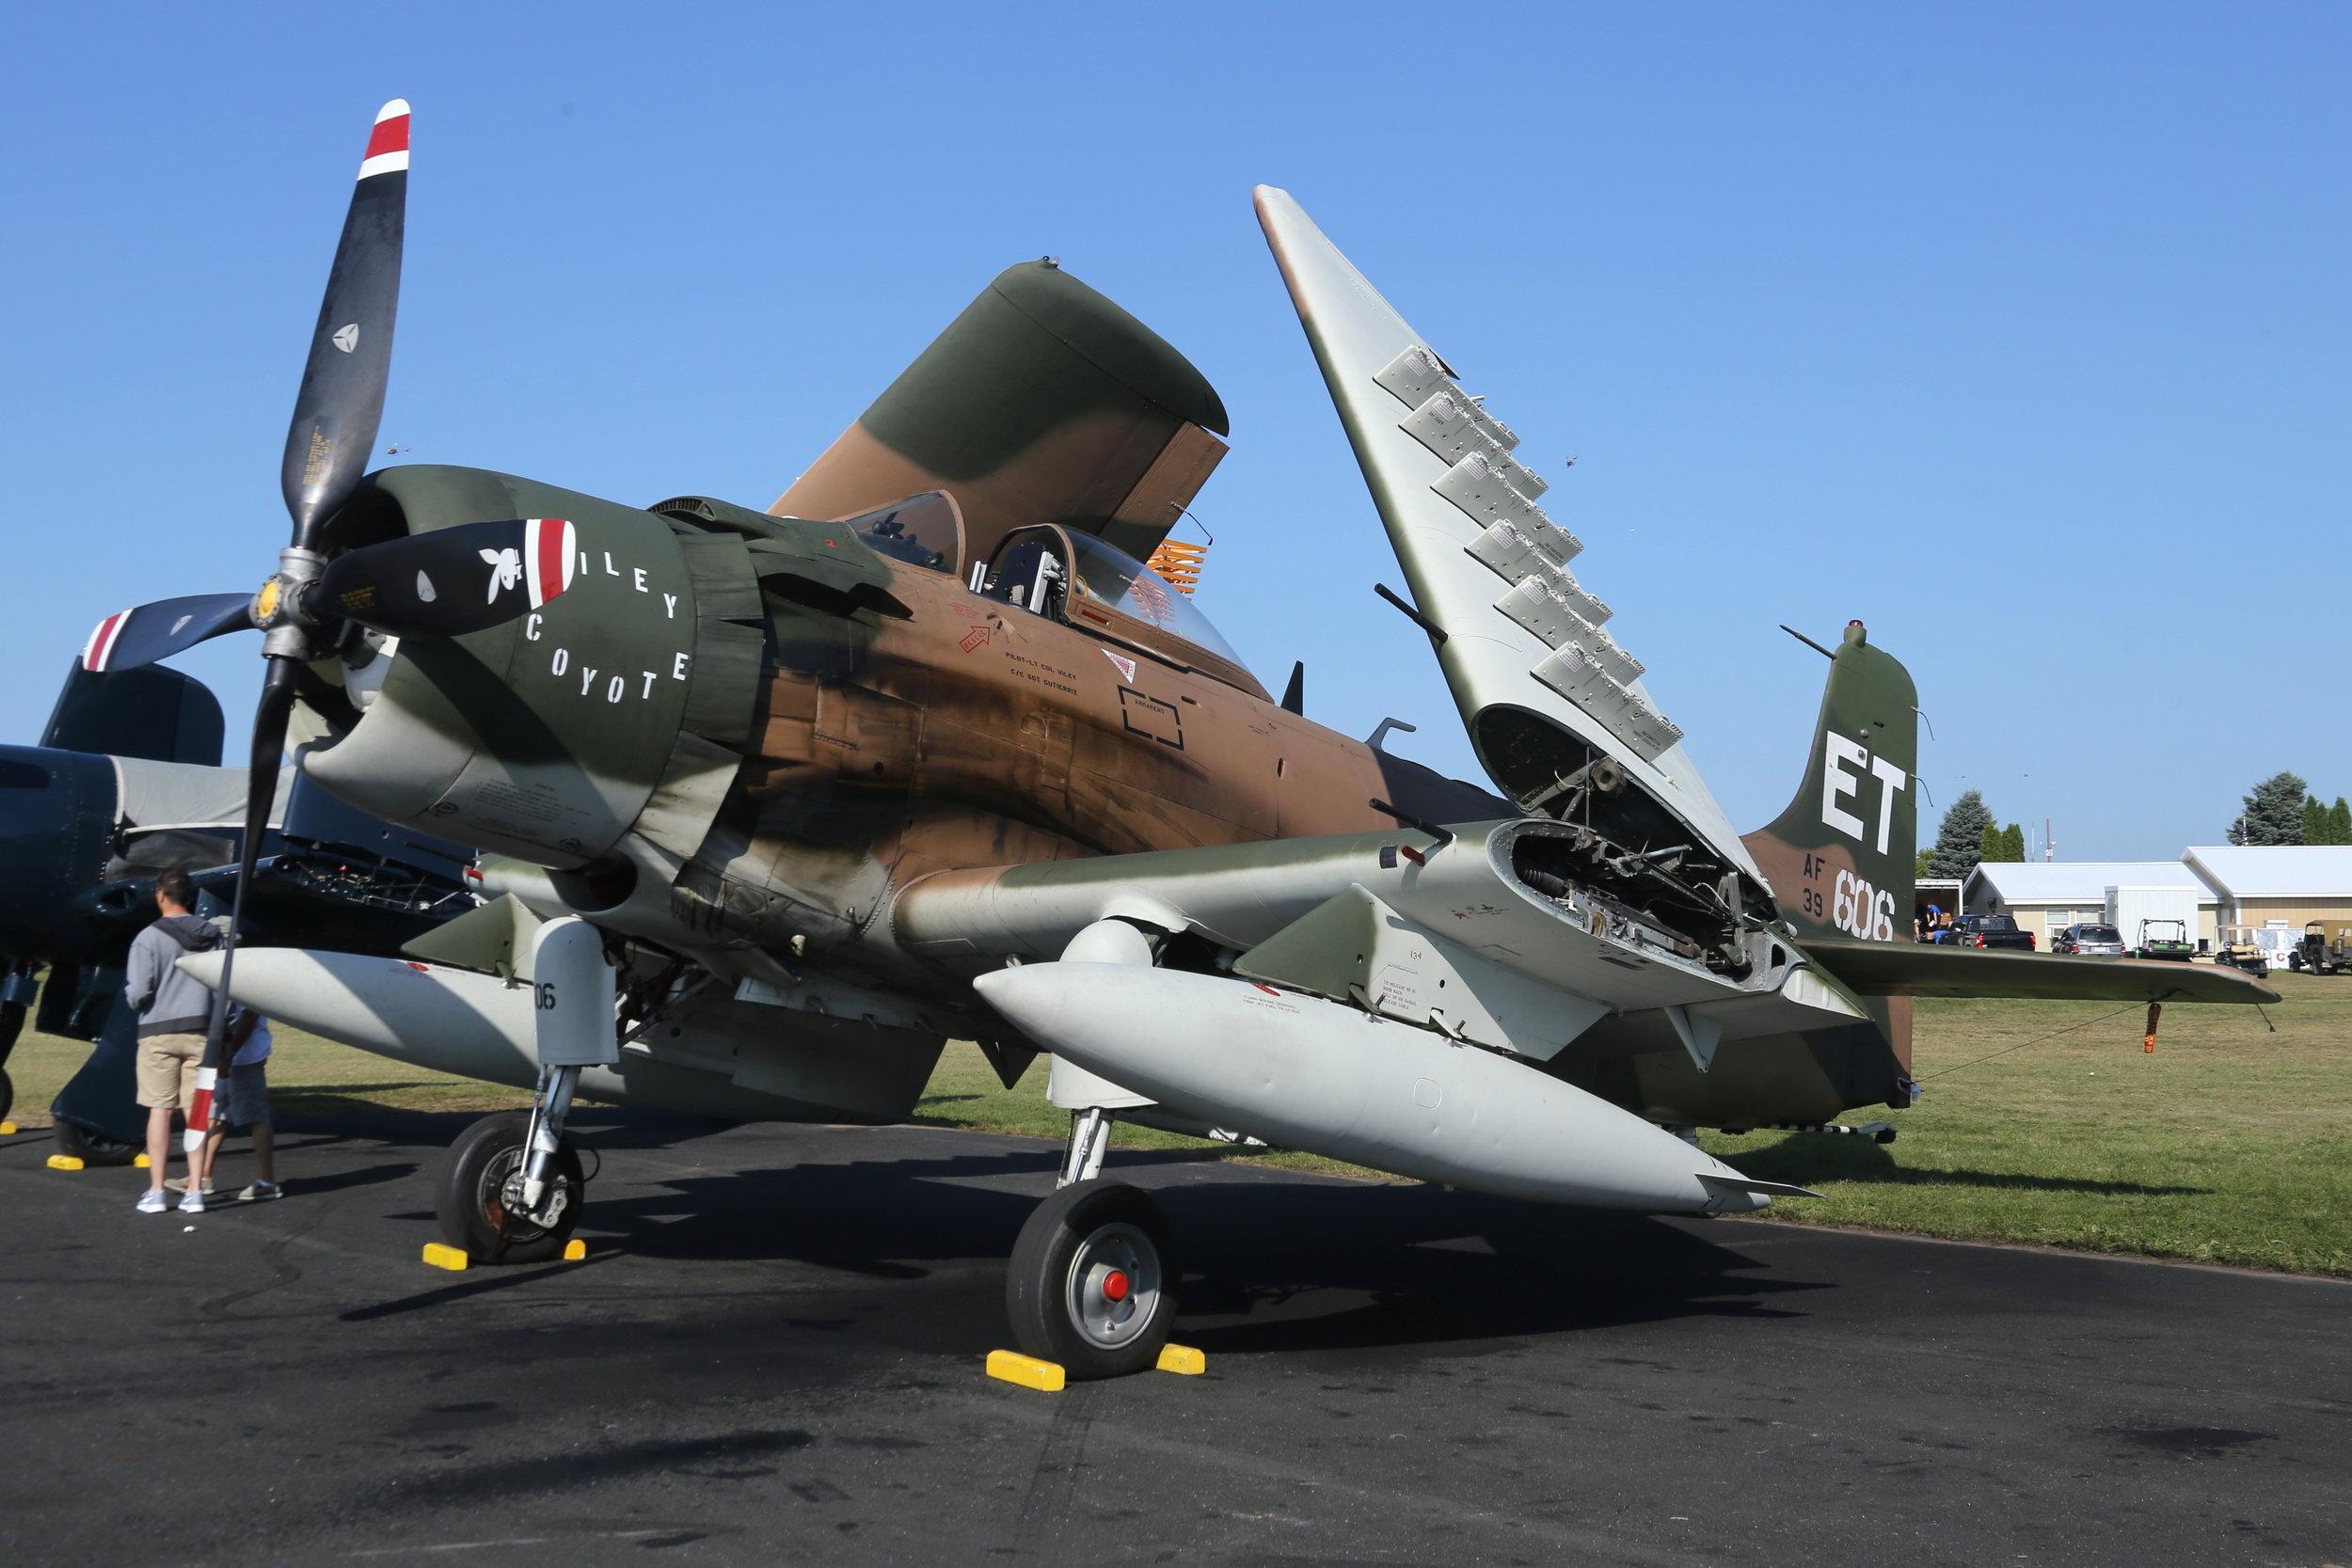 N39606 Douglas A1H Skyraider taken at Oshkosh 28th July 2018 by John Wood